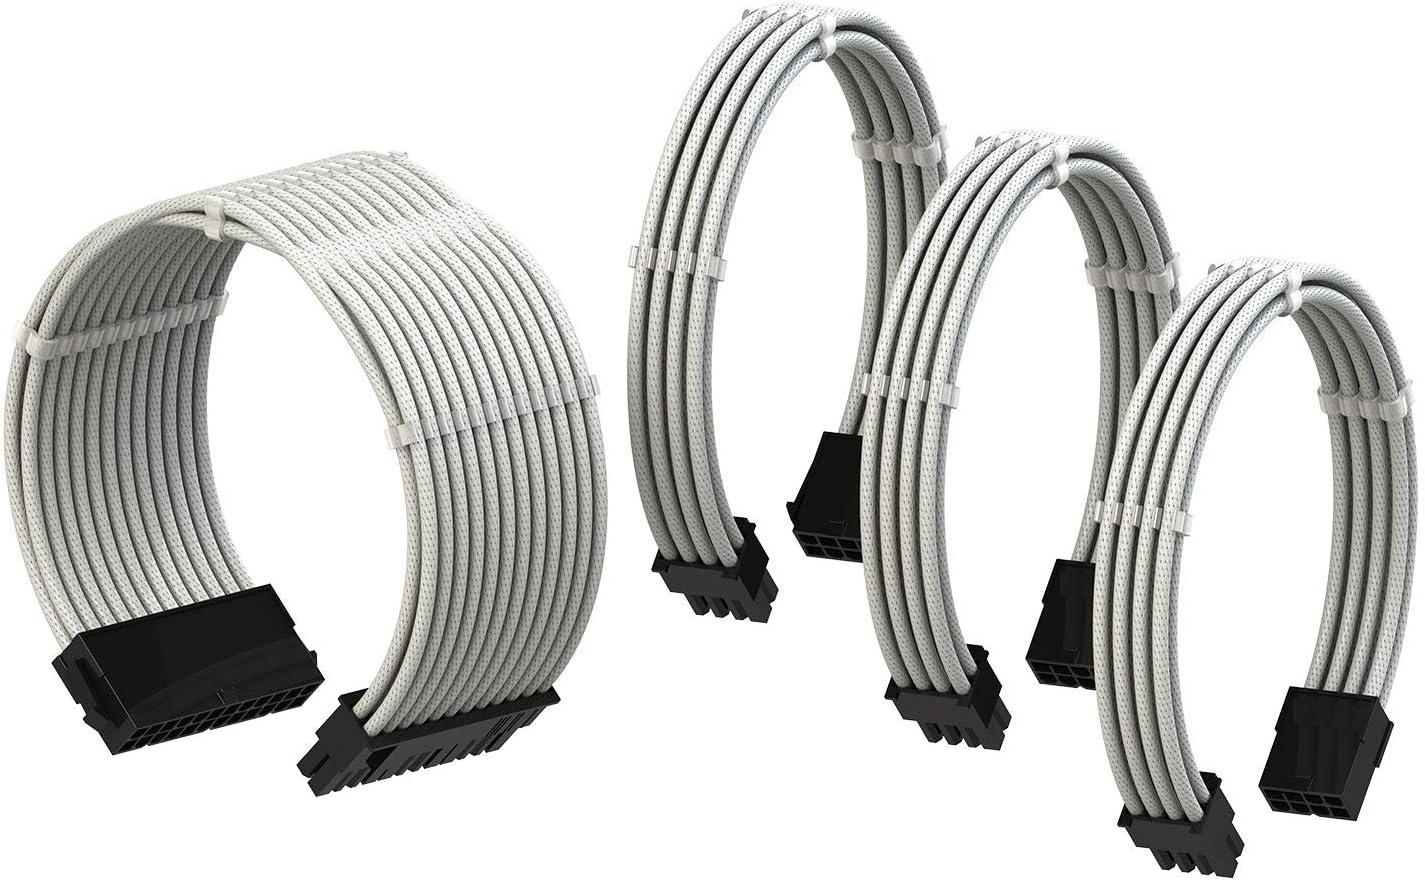 LINKUP PSU Cable Extension Sleeved Custom Mod GPU PC Power Supply Braided w/Comb Kit |1x 24 P (20+4) | 1x 8 P (4+4) CPU | 2X 8 P (6+2) GPU Set | 30CM 300MM - White